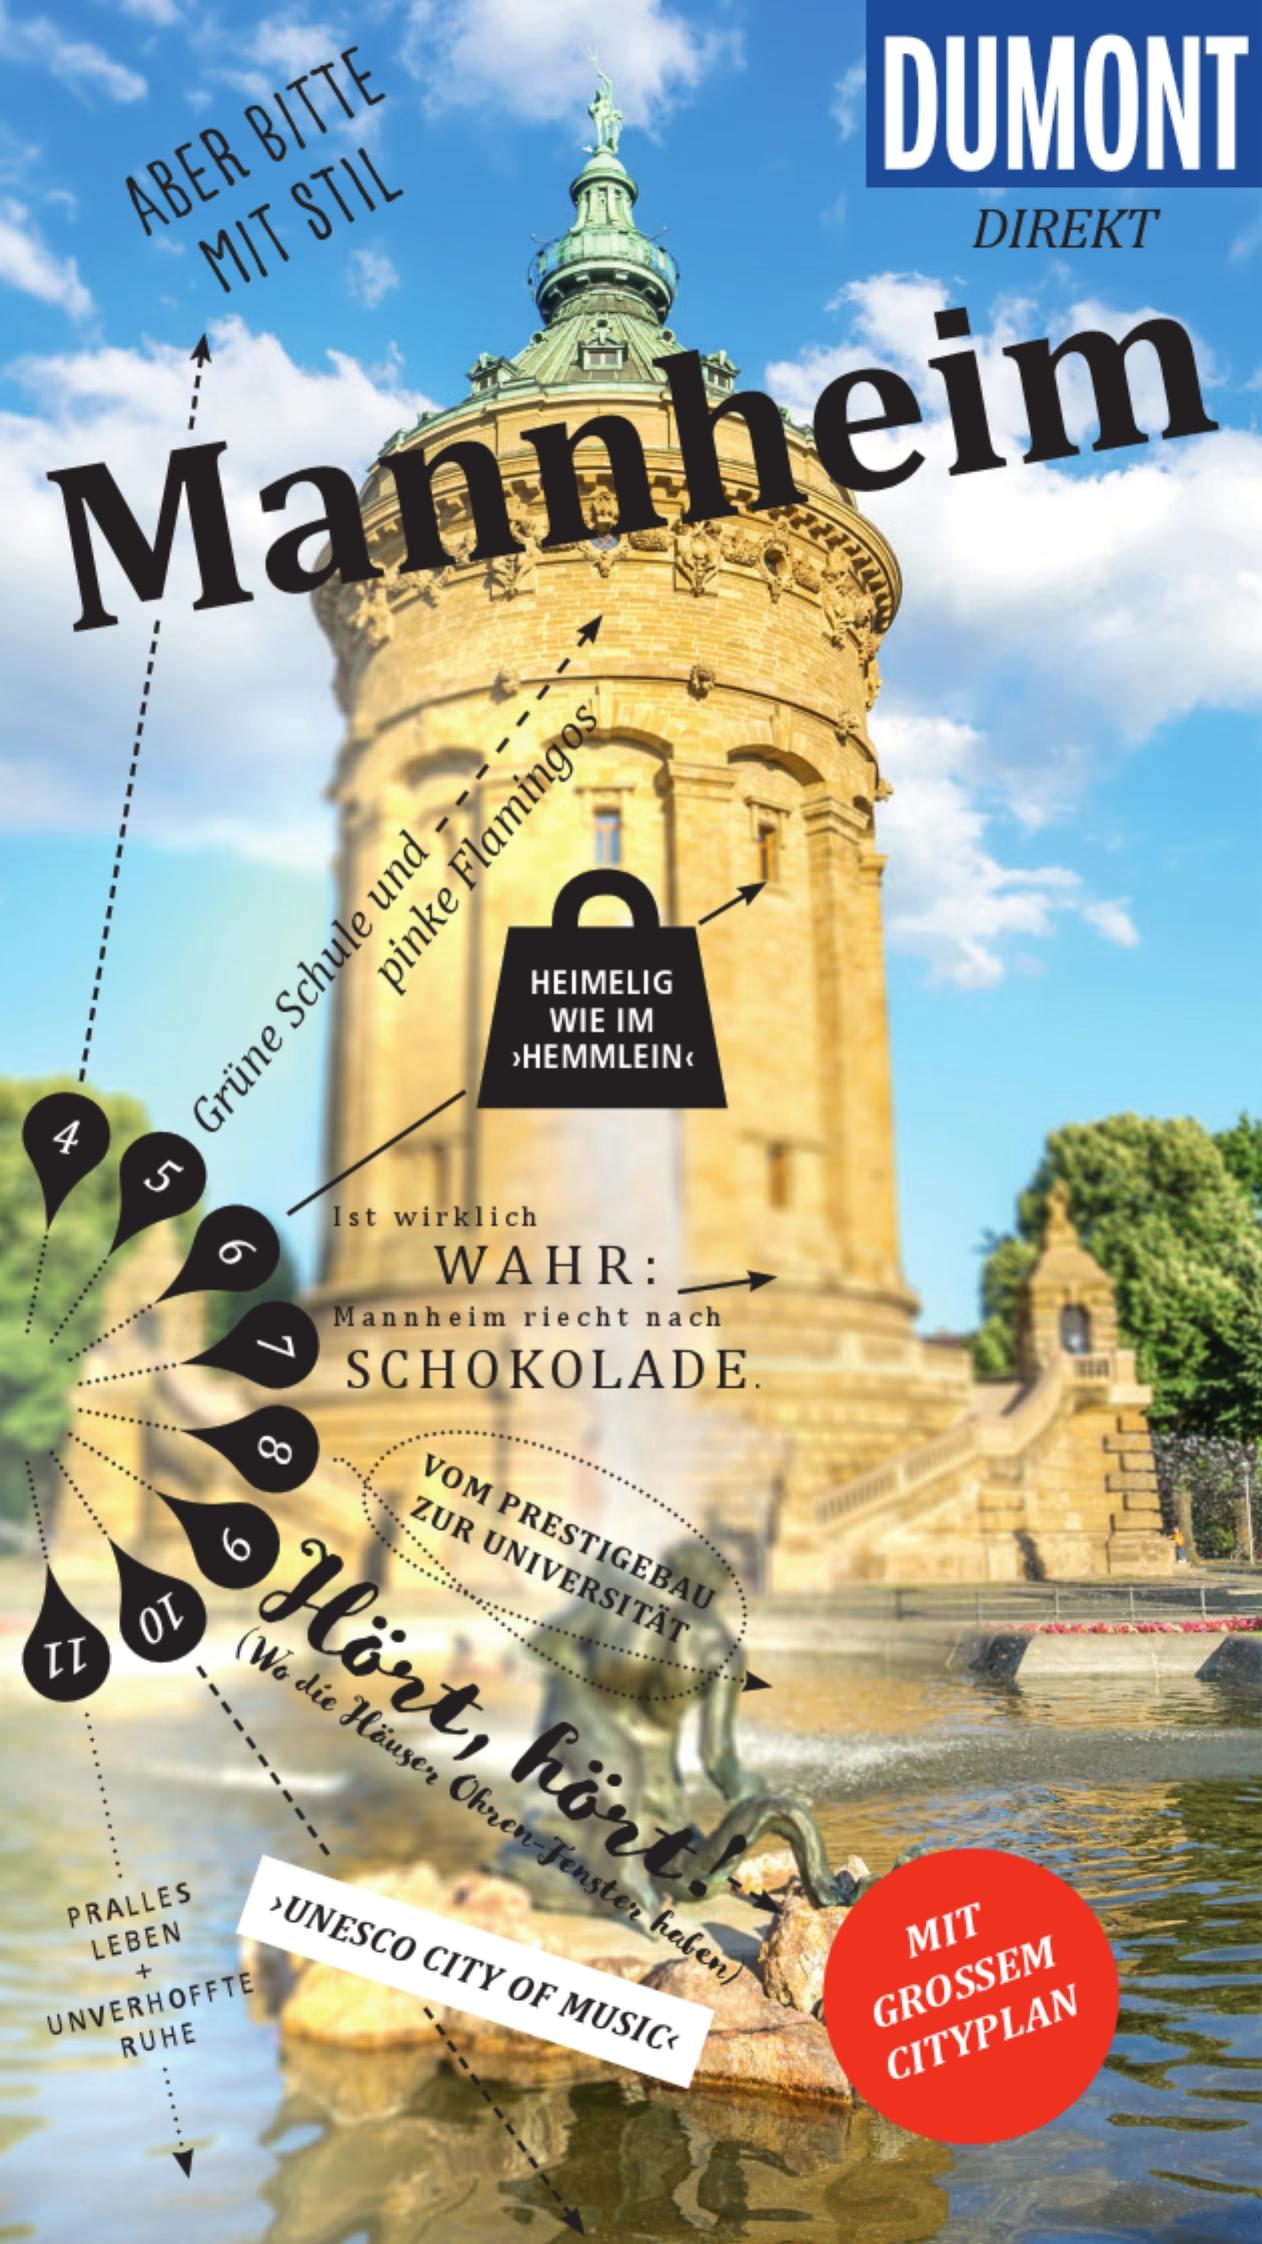 DuMont Direkt - Mannheim (Cover)